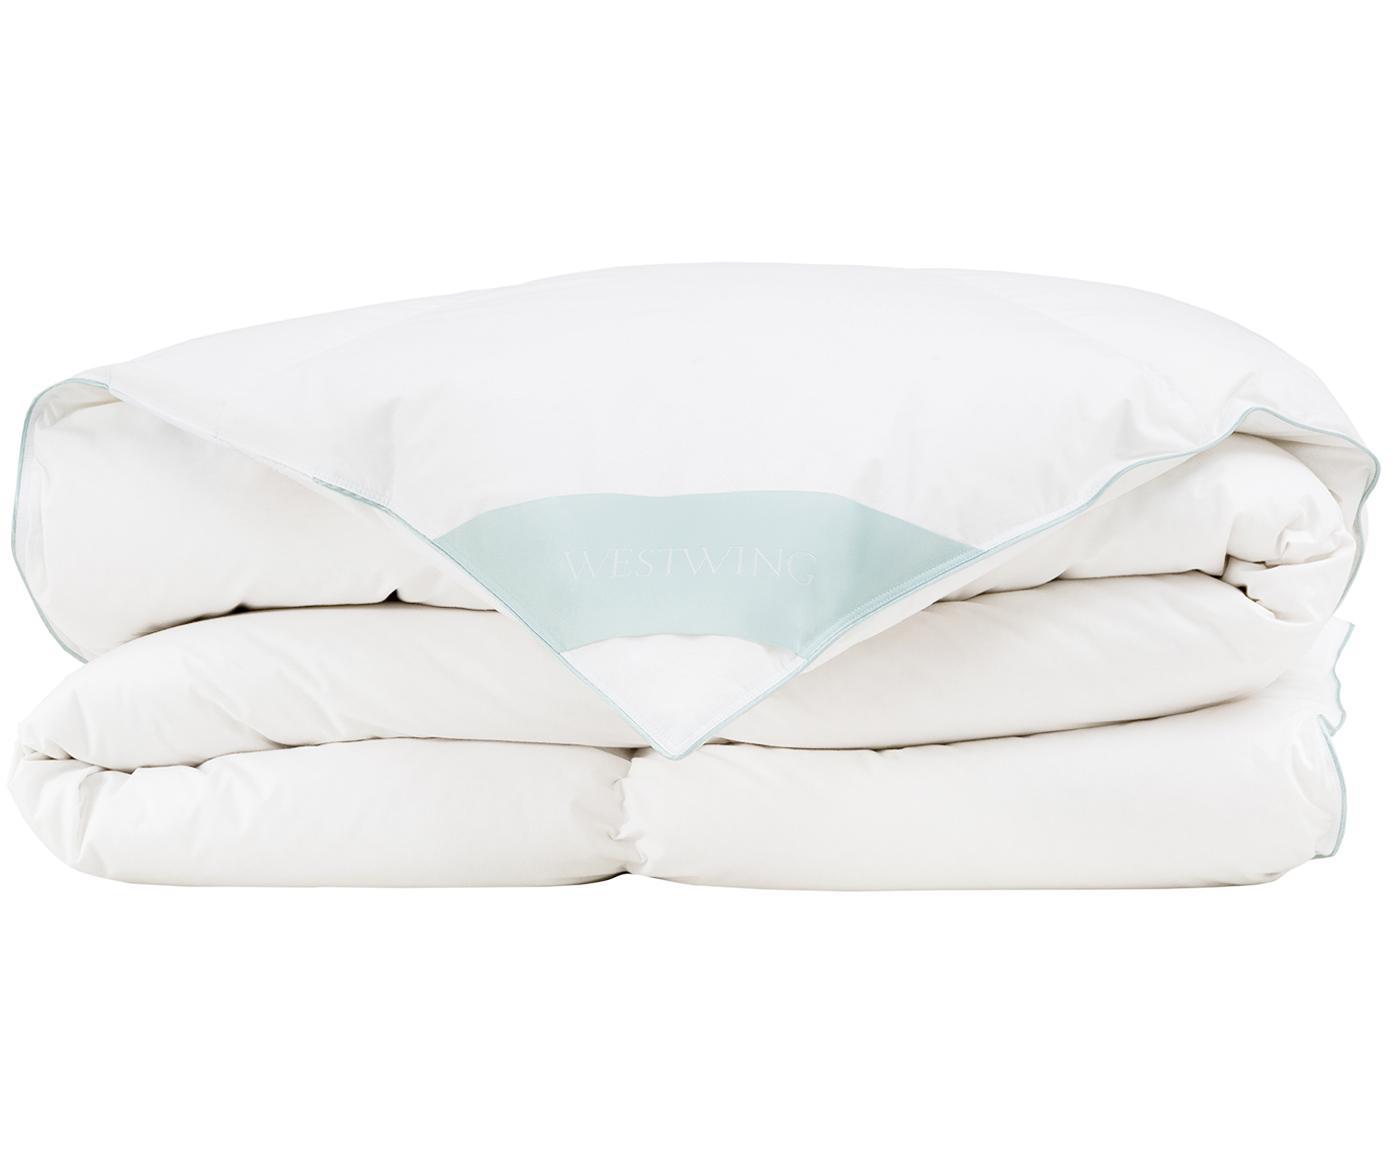 Daunen-Bettdecke Comfort, warm, Hülle: 100% Baumwolle, feine Mak, Weiß, 135 x 200 cm